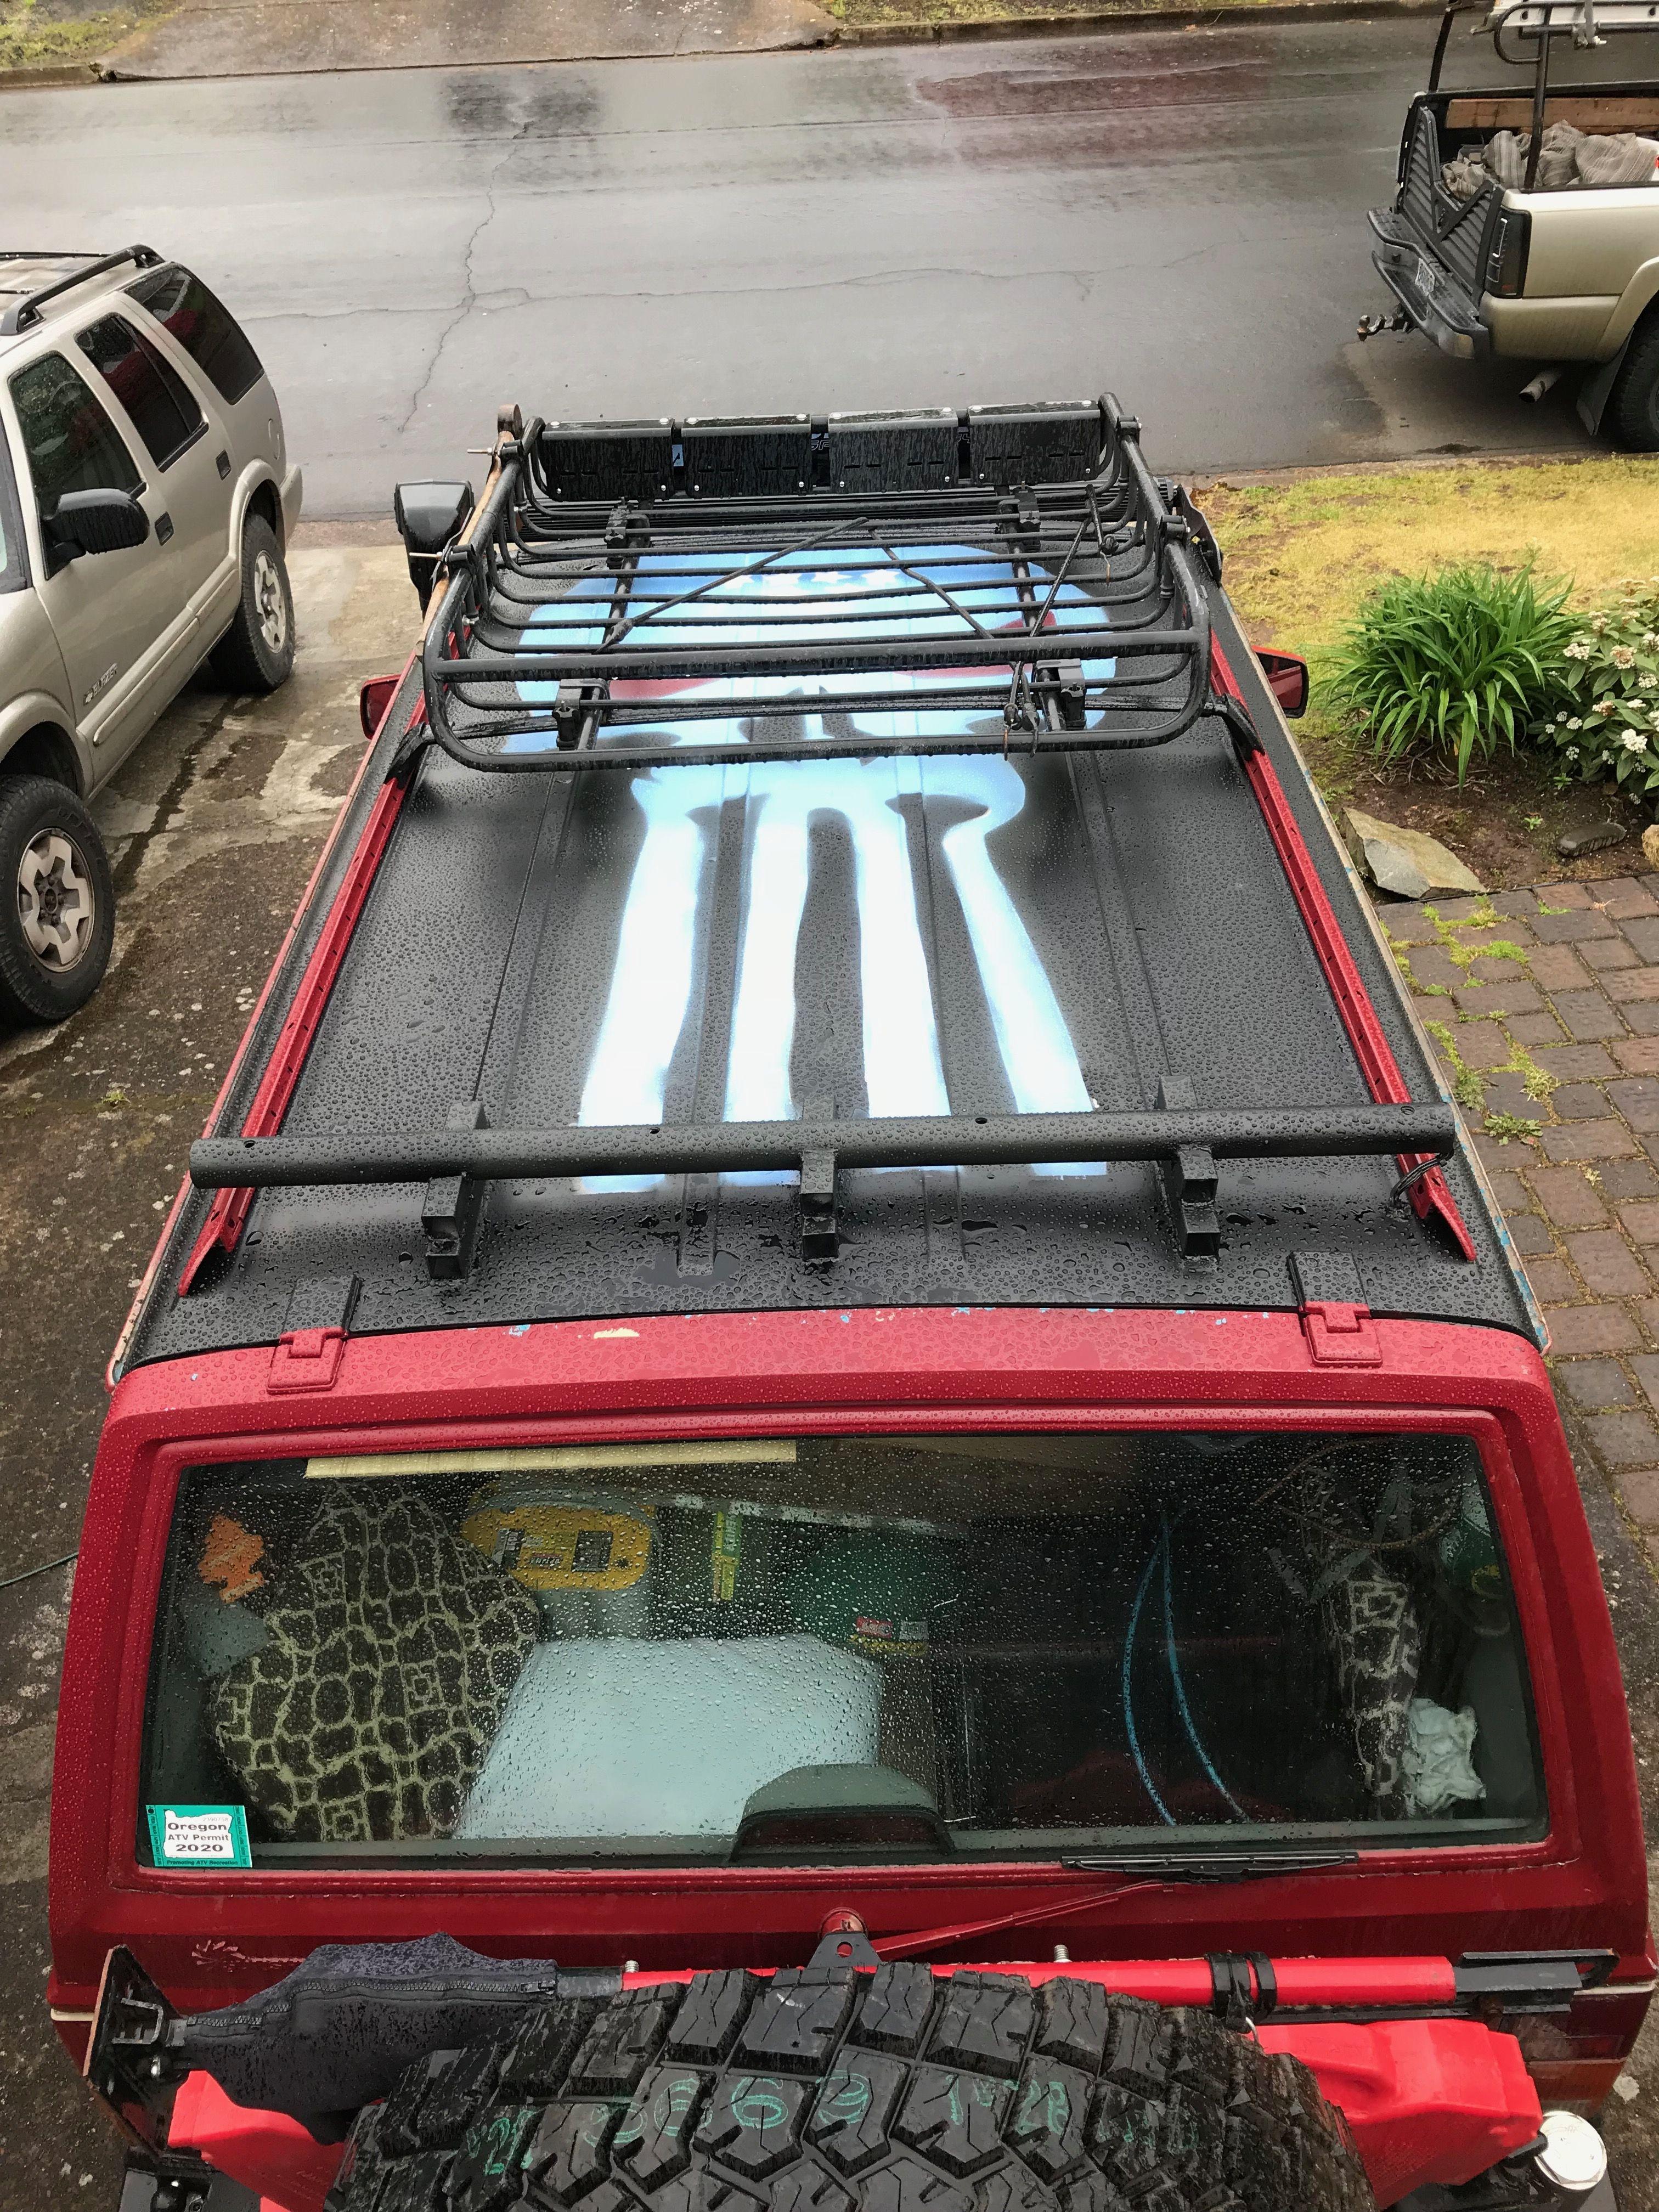 Xj Punisher Jeep Punisher Brinkersllc Jeep Punisher 4x4